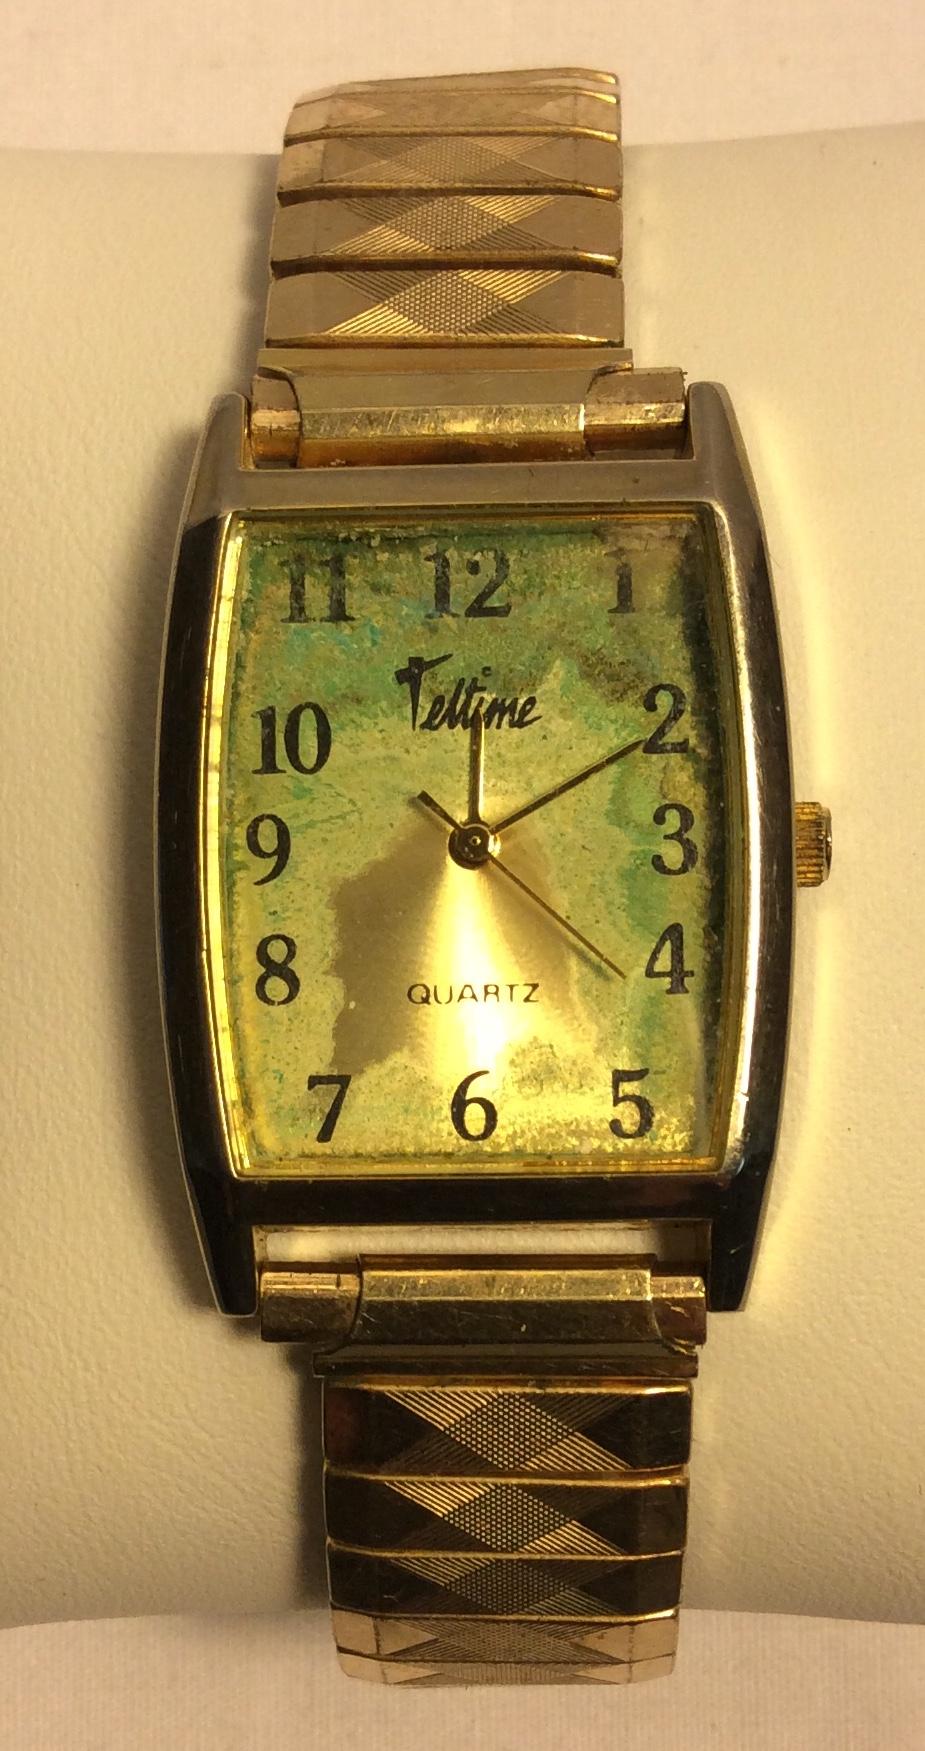 Telltime watch - Rectagular aged